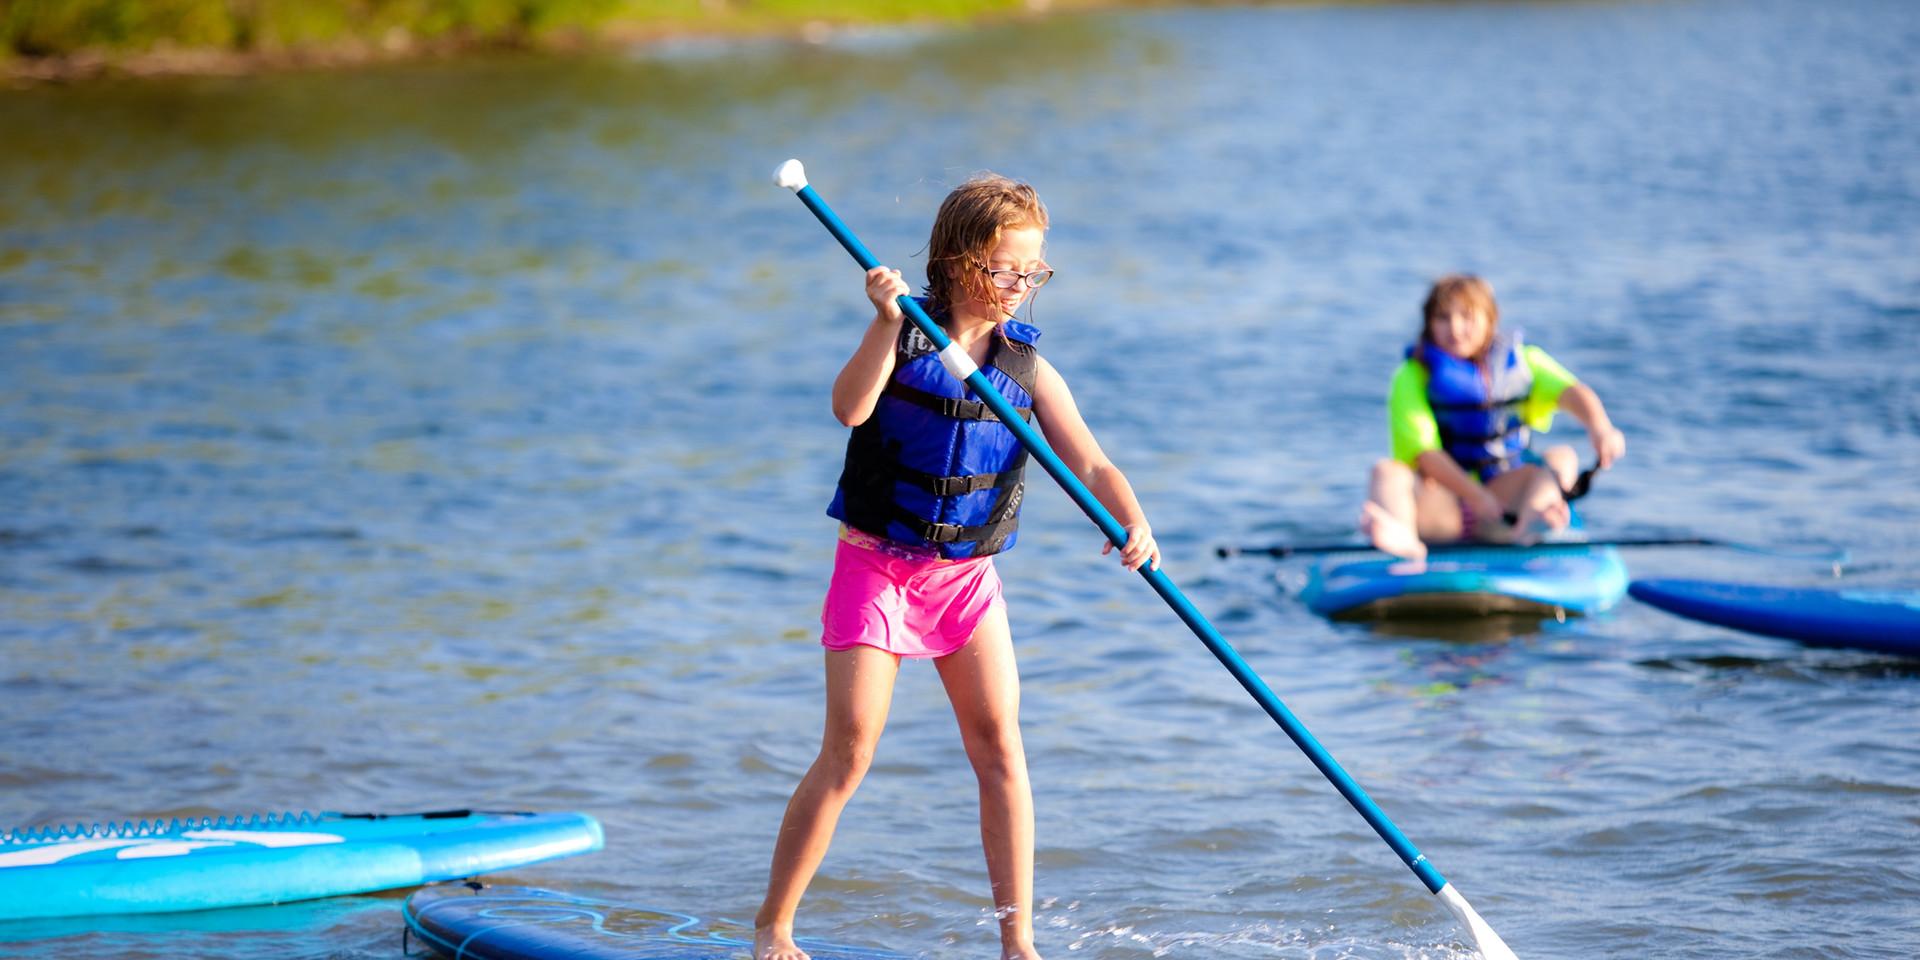 paddle-board-1629165.jpg